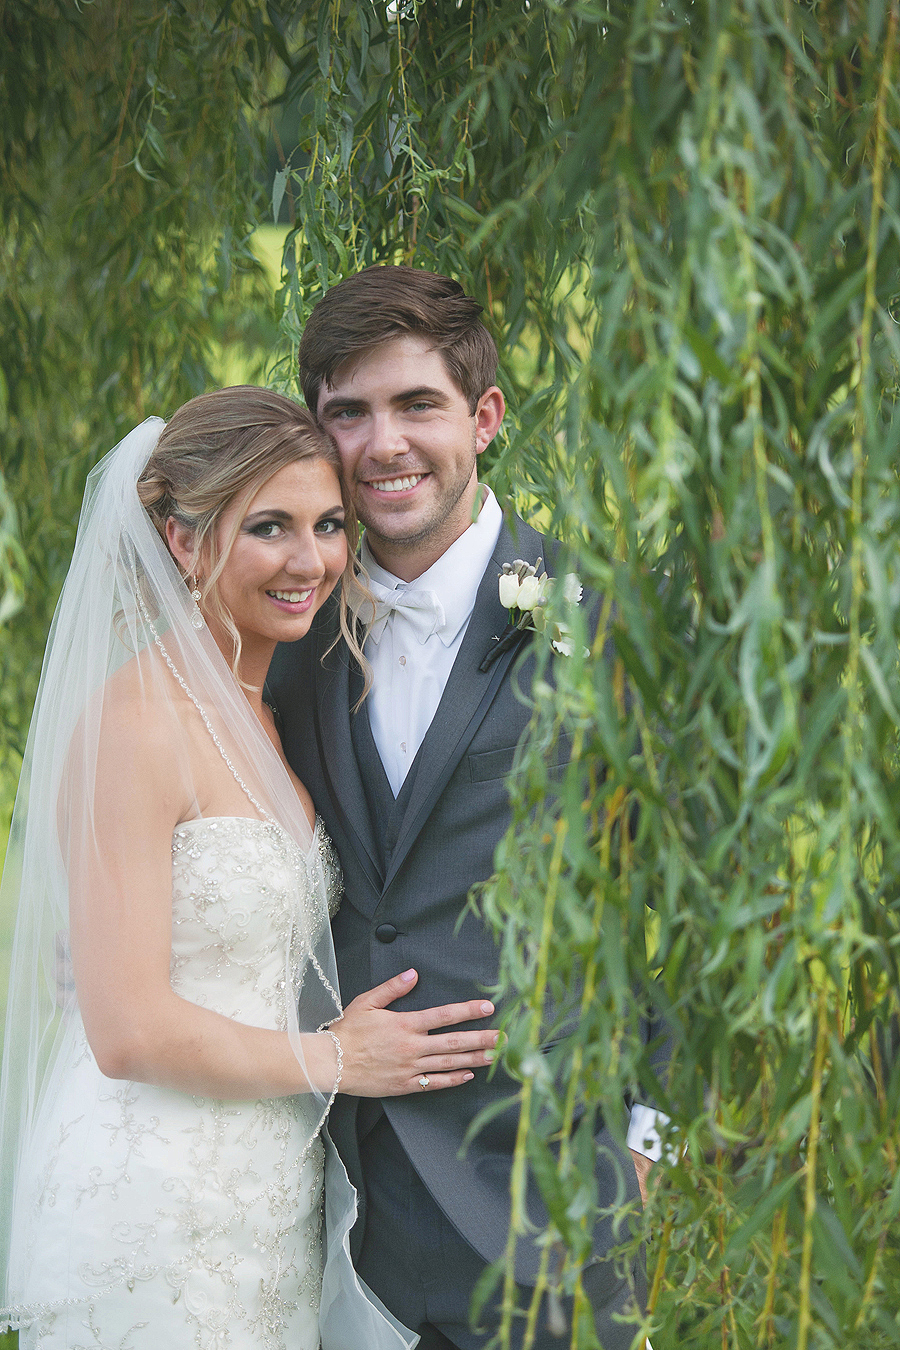 Toledo_Cleveland_Ohio_Wedding_Portrait_Photographer-26.jpg